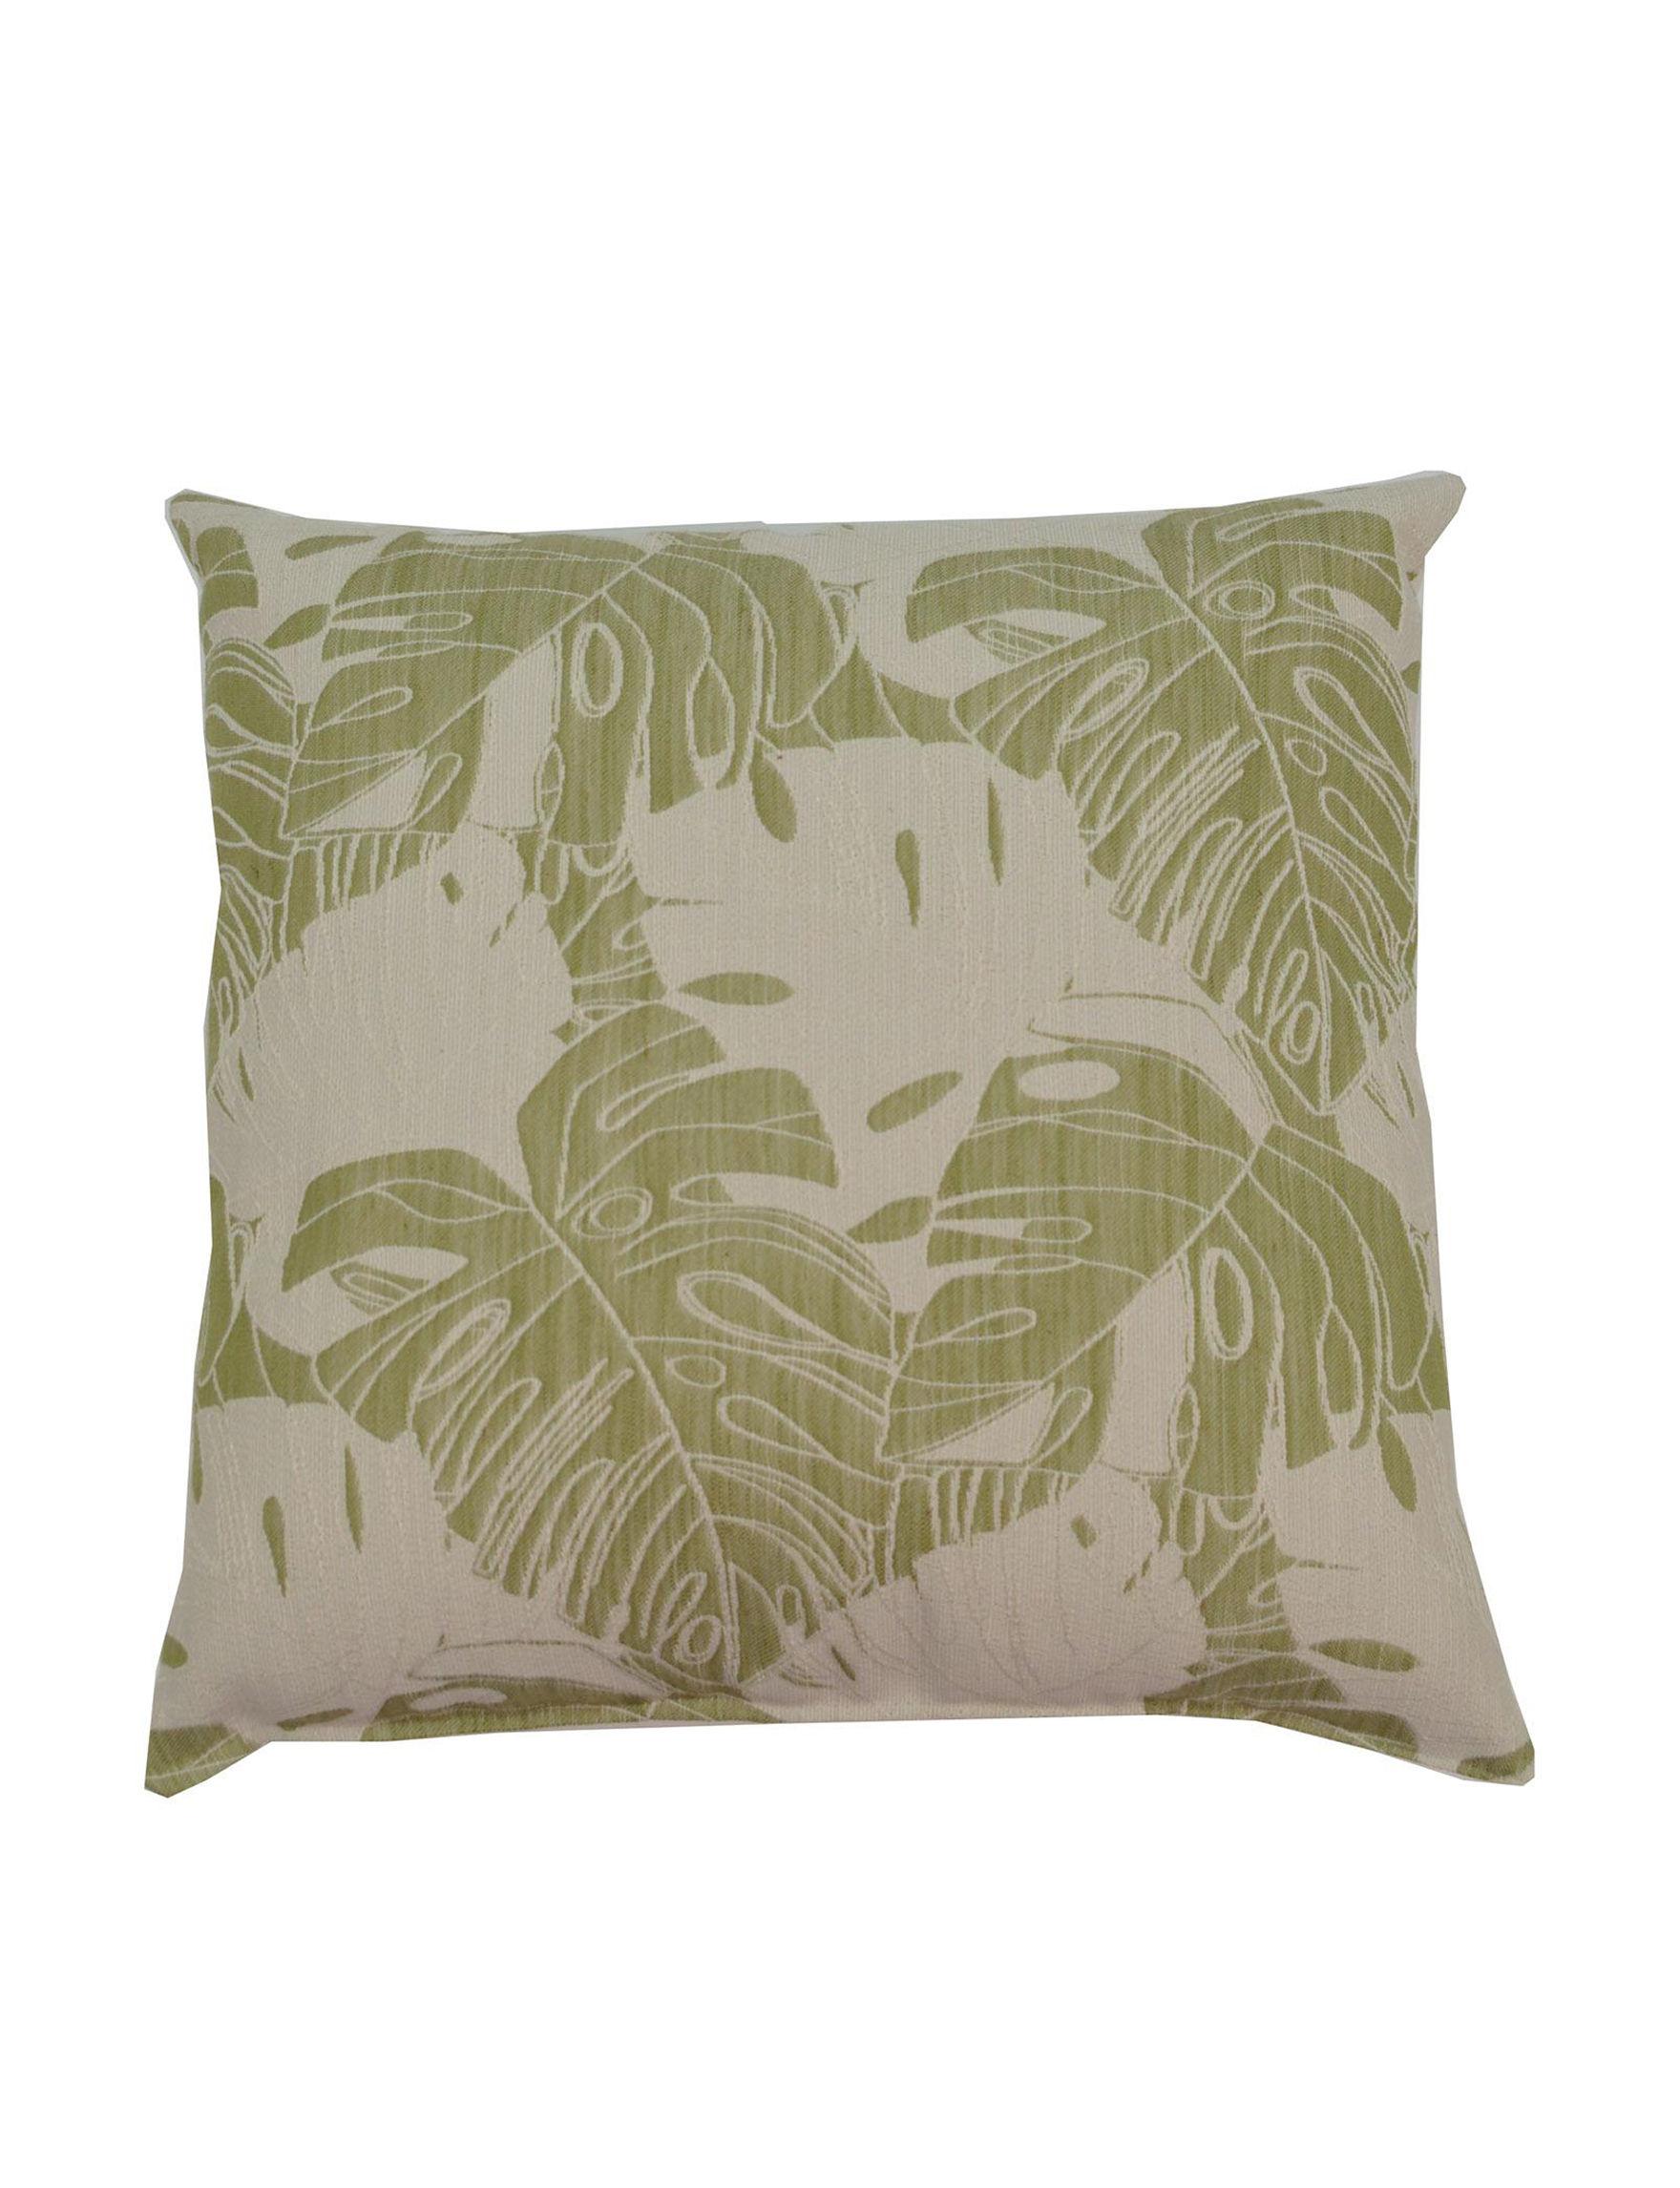 Creative Home Furnishings Green / Beige Decorative Pillows